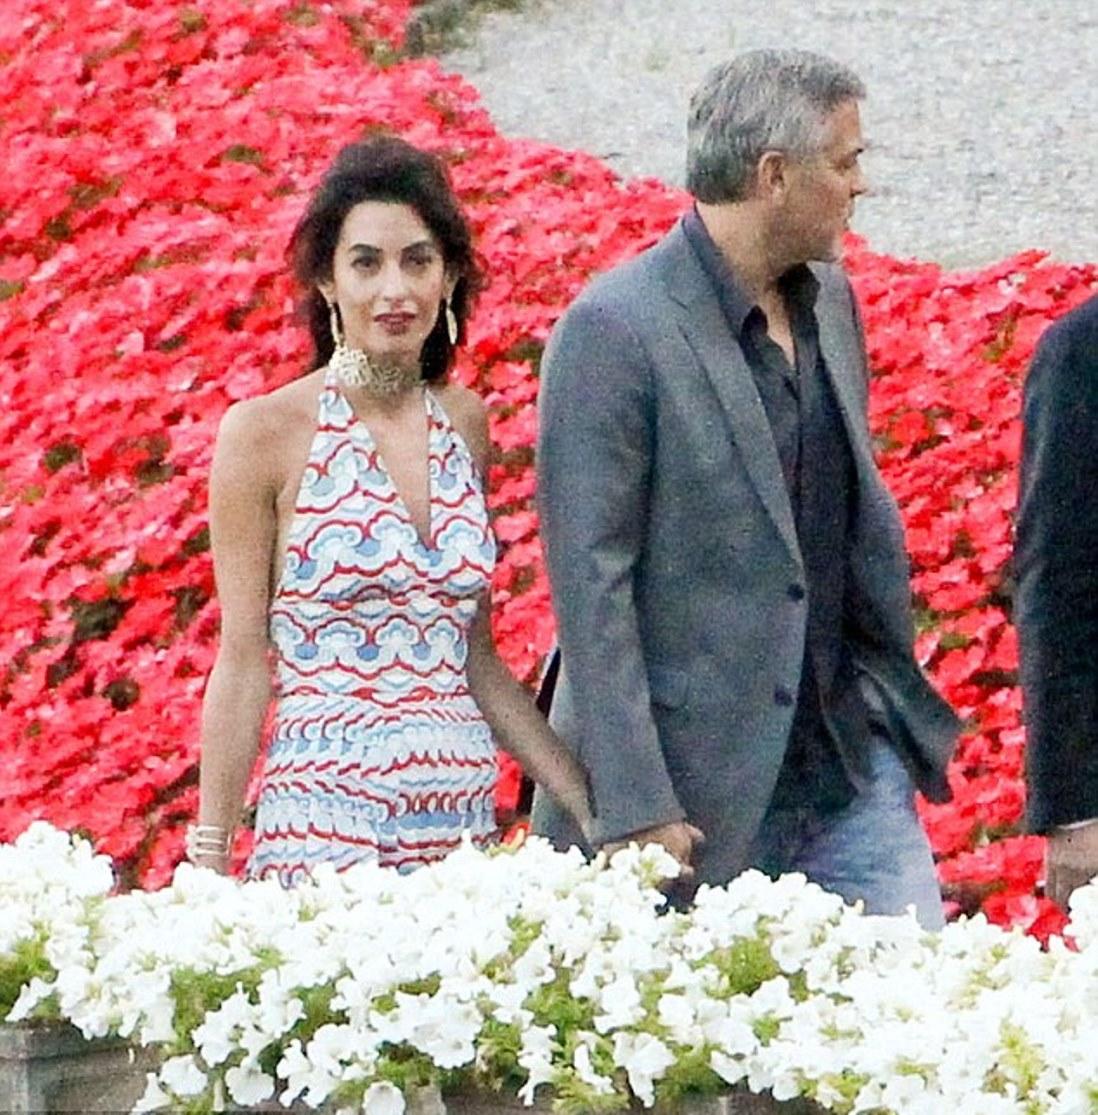 Hotel Villa Deste Como: Amal Clooney Spotted In A Valentino Dress At The Villa D